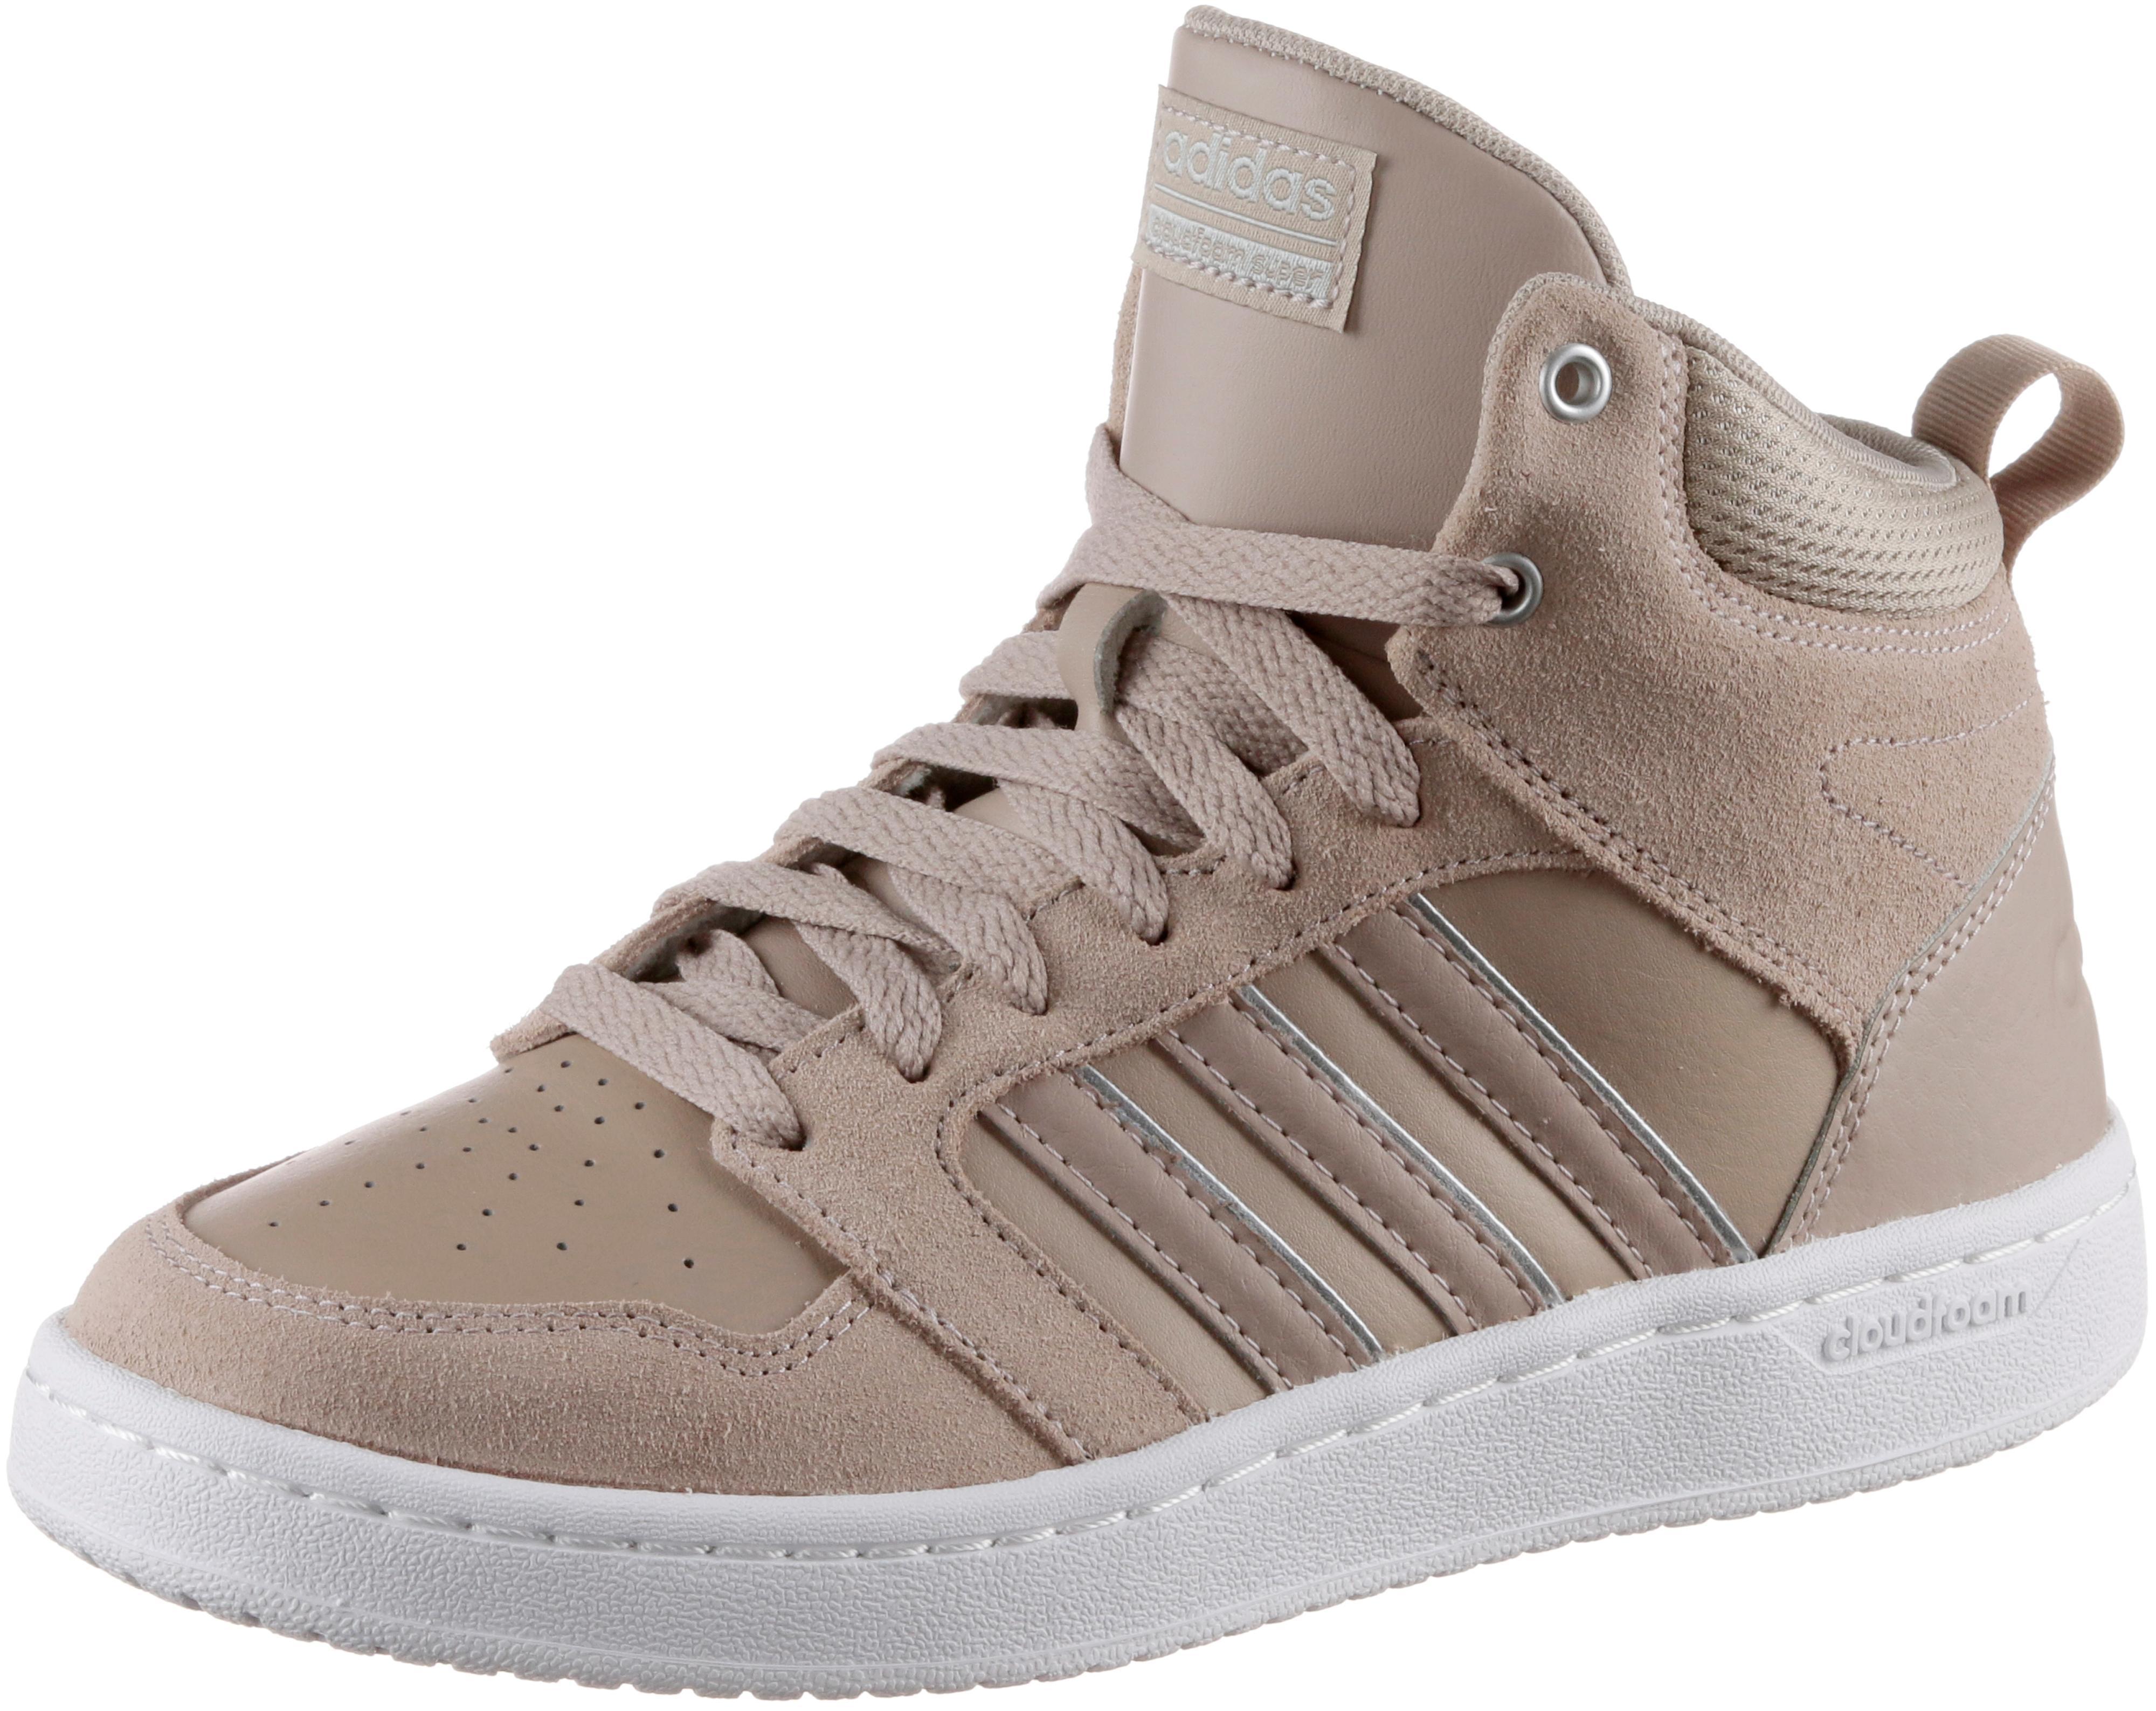 Knöchelhohe Adidas Turnschuhe Turnschuhe Knöchelhohe